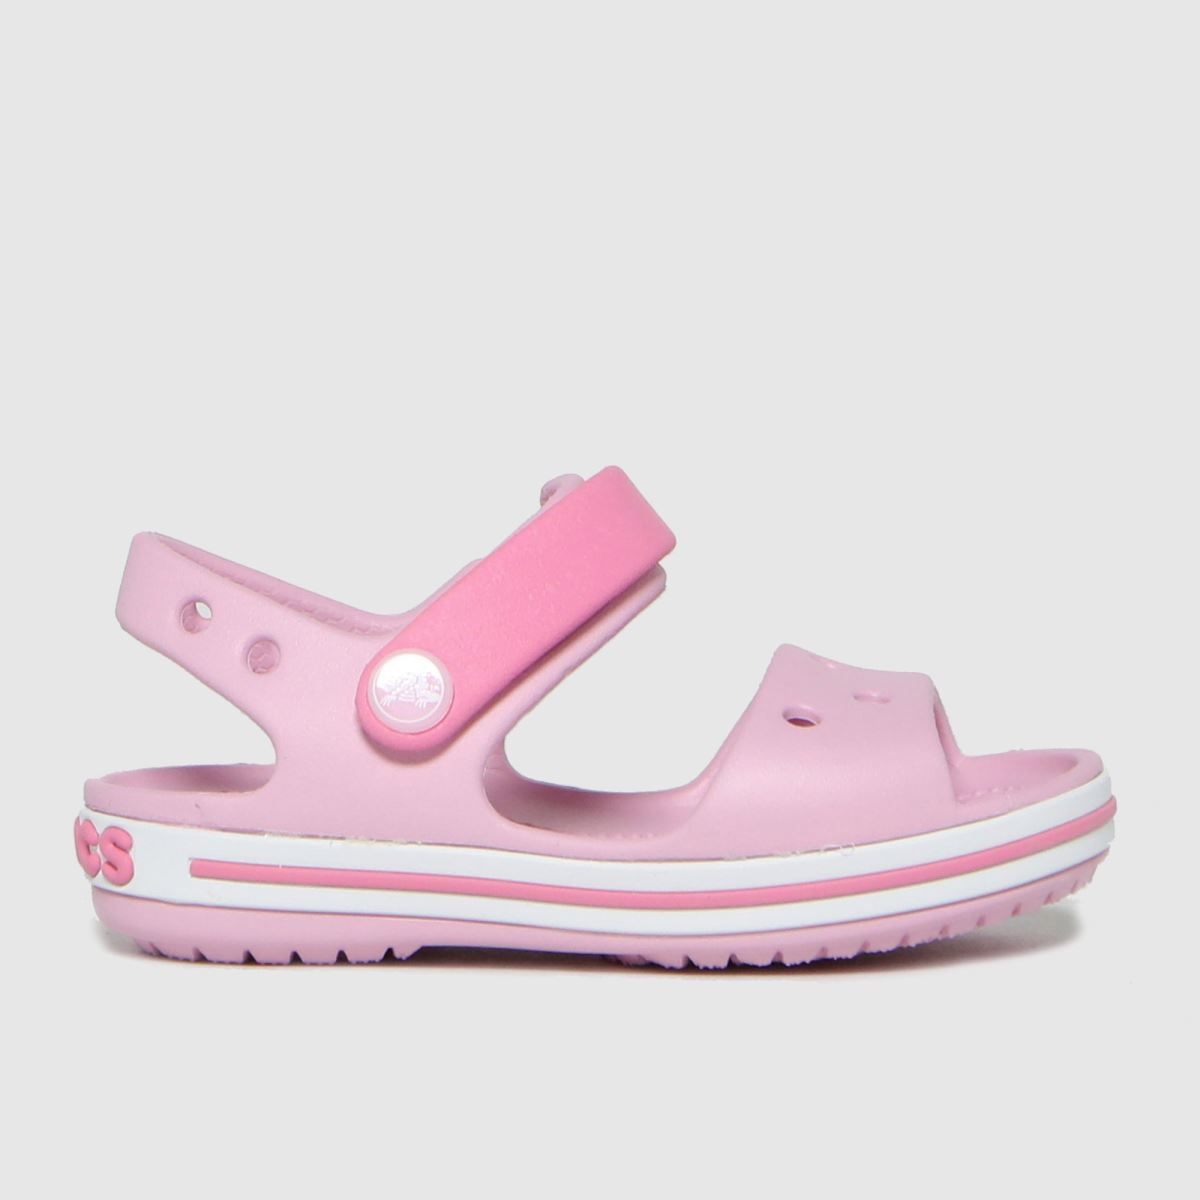 Crocs Purple Crocband SANDAL Toddler